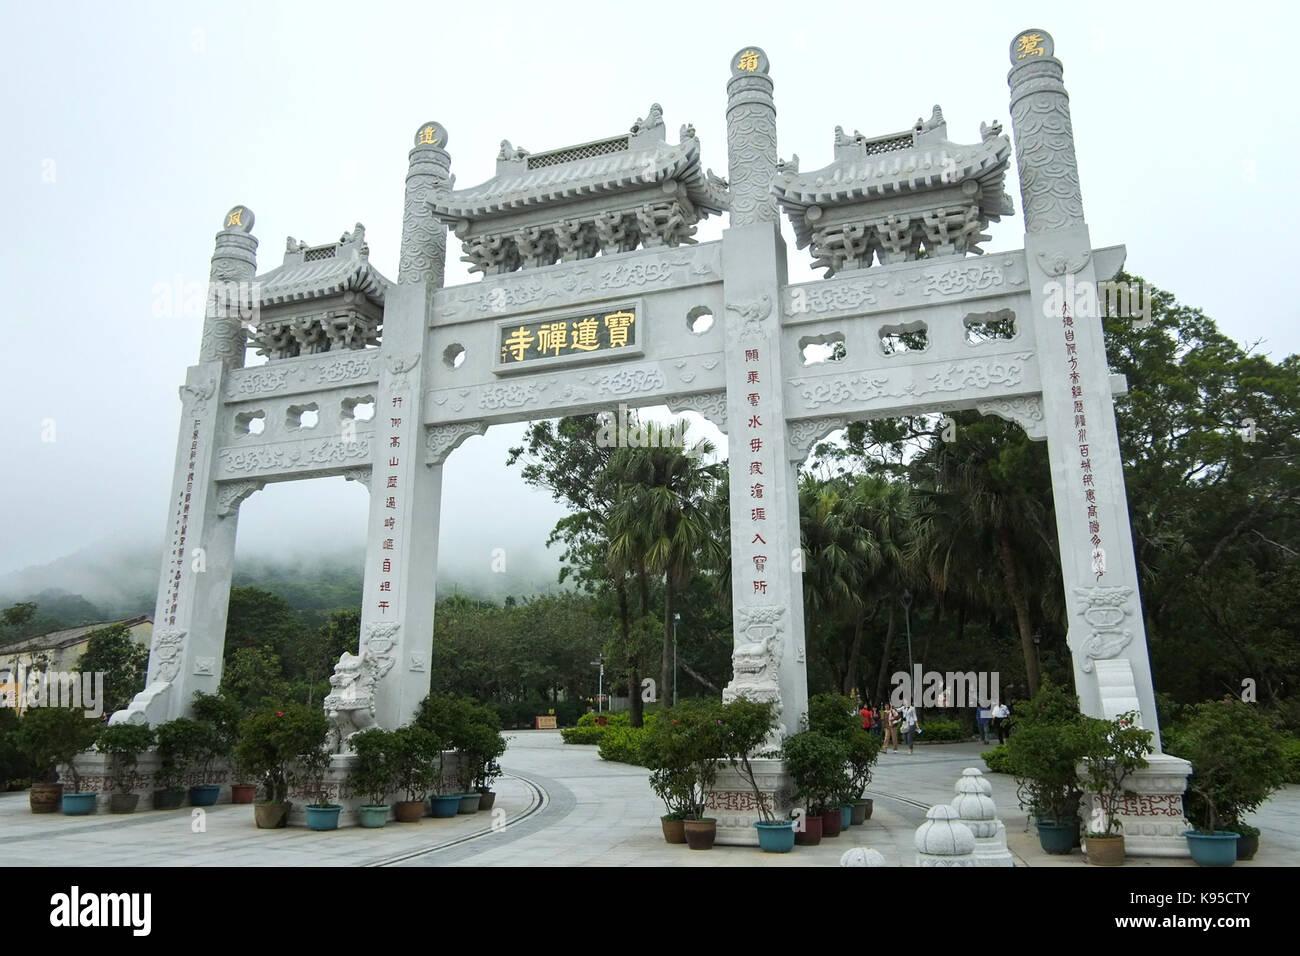 Tian Tan Buddha The Big Buddha and Po Lin Monastery. Arch at the entrance to Po Lin monastery.  © Jayne Russell/Alamy - Stock Image